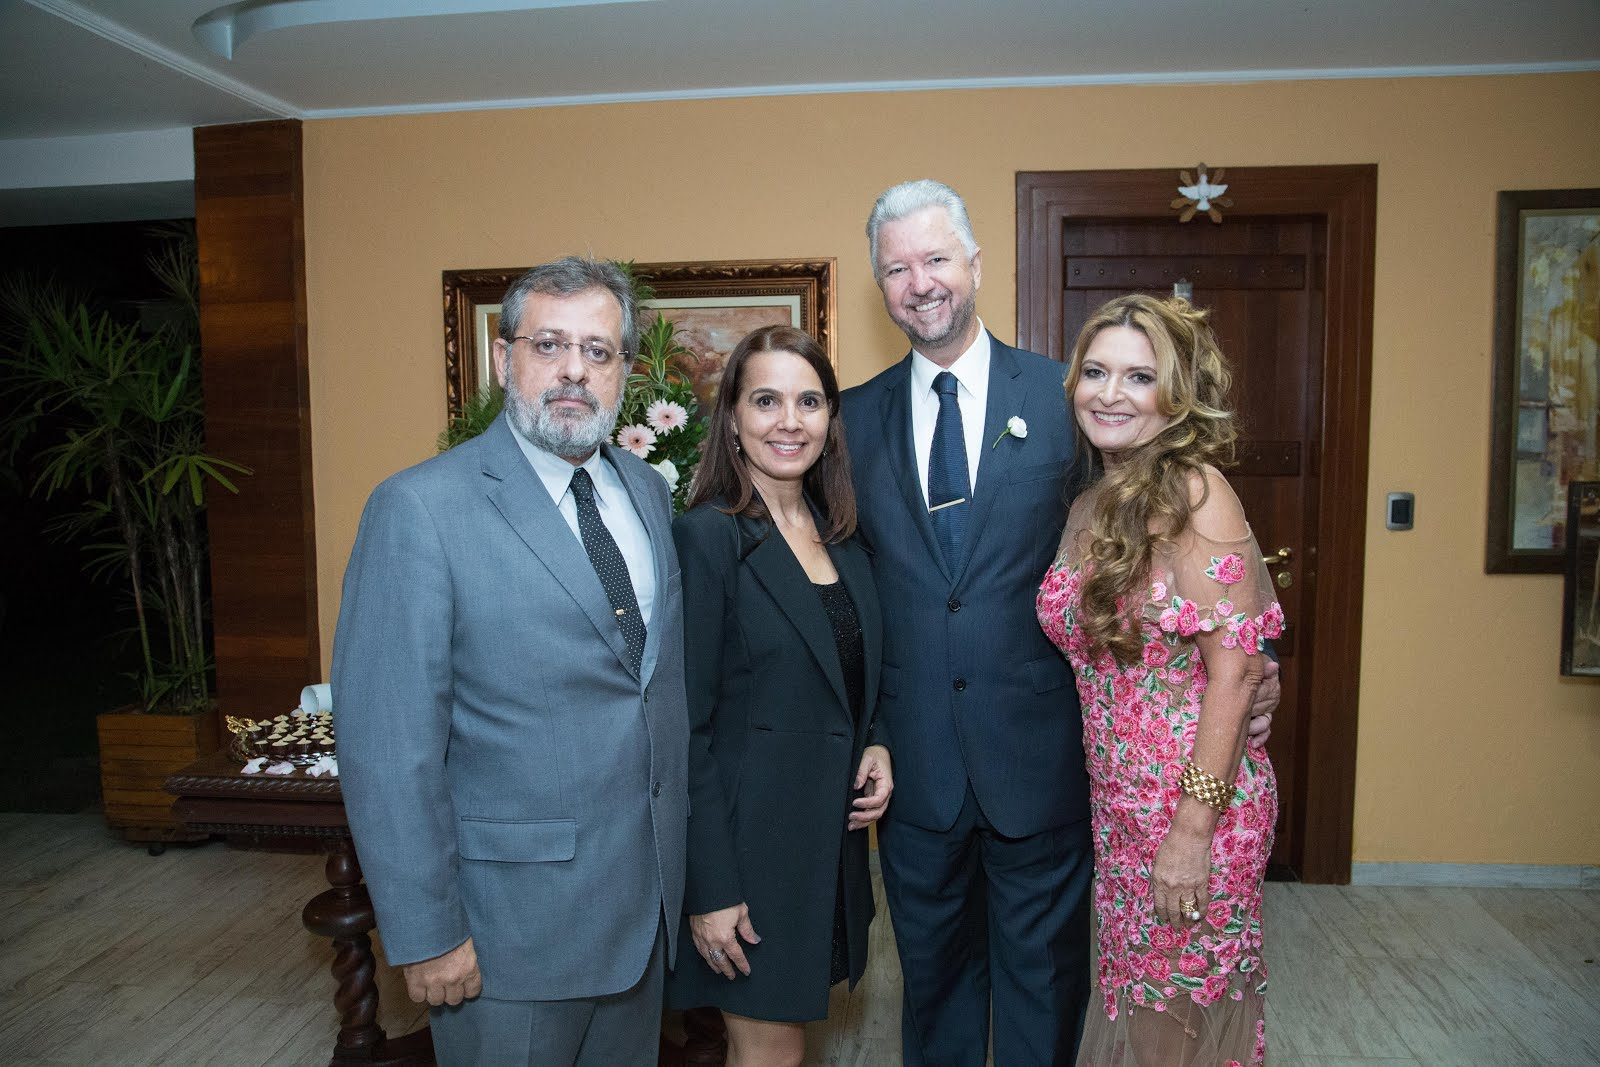 com os anfitriões Luiz Pietschamann e Sandra Miranda